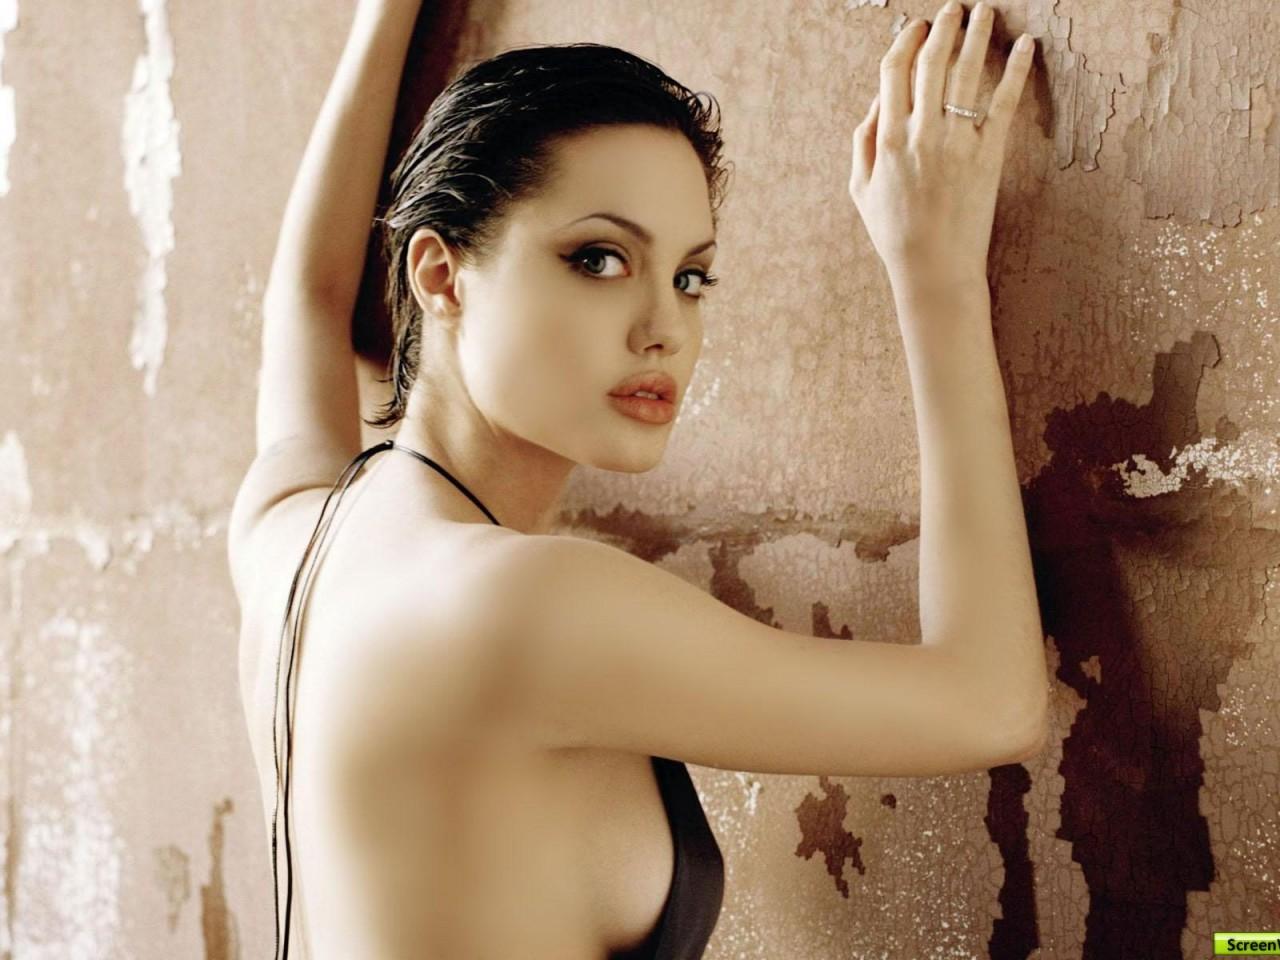 http://1.bp.blogspot.com/-3W3vBLq22VI/T99zwVVfyKI/AAAAAAAAAQ4/XfEq1RS4p-E/s1600/Angelina-Jolie--hot-sexy-actress-hollywood-star-pictures-wallpapers-widescreen-supermodel-photo-gallery-widescreen-wallpaper-latest-wallpapers-1280x960.jpg